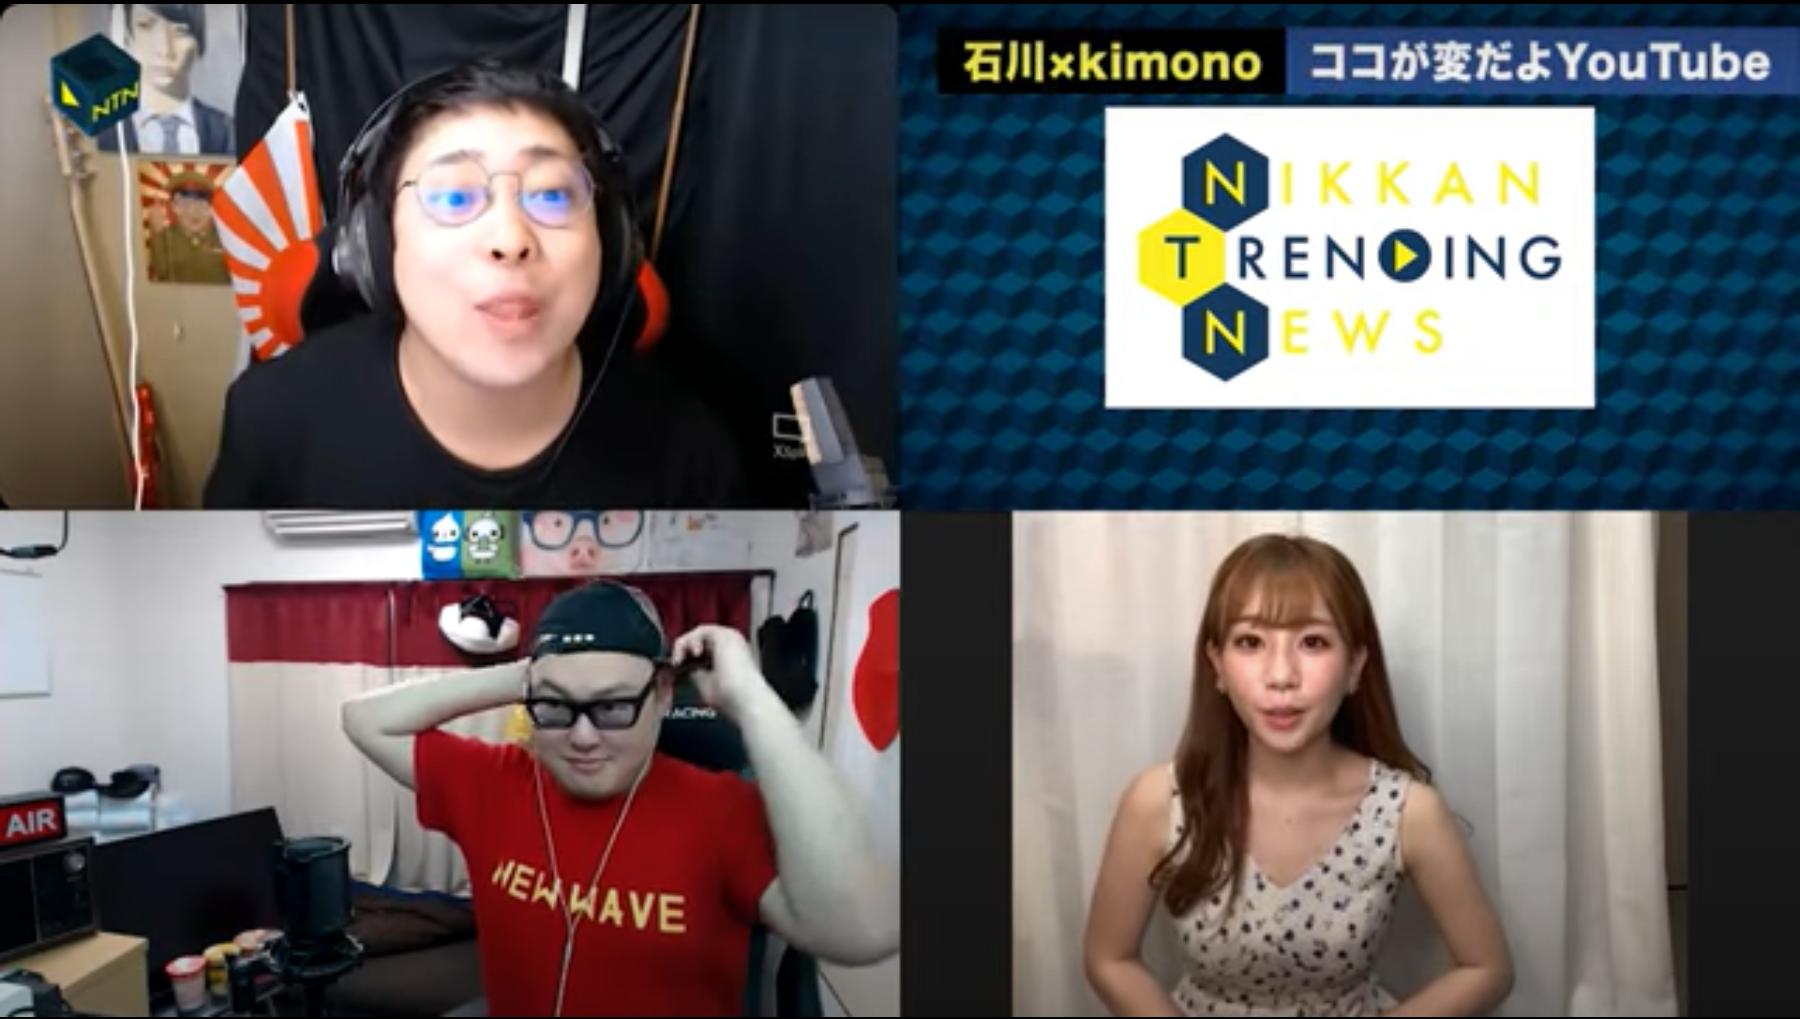 『YouTuber引退したらどうなるの?』【石川×kimonoのココが変だよYouTube】